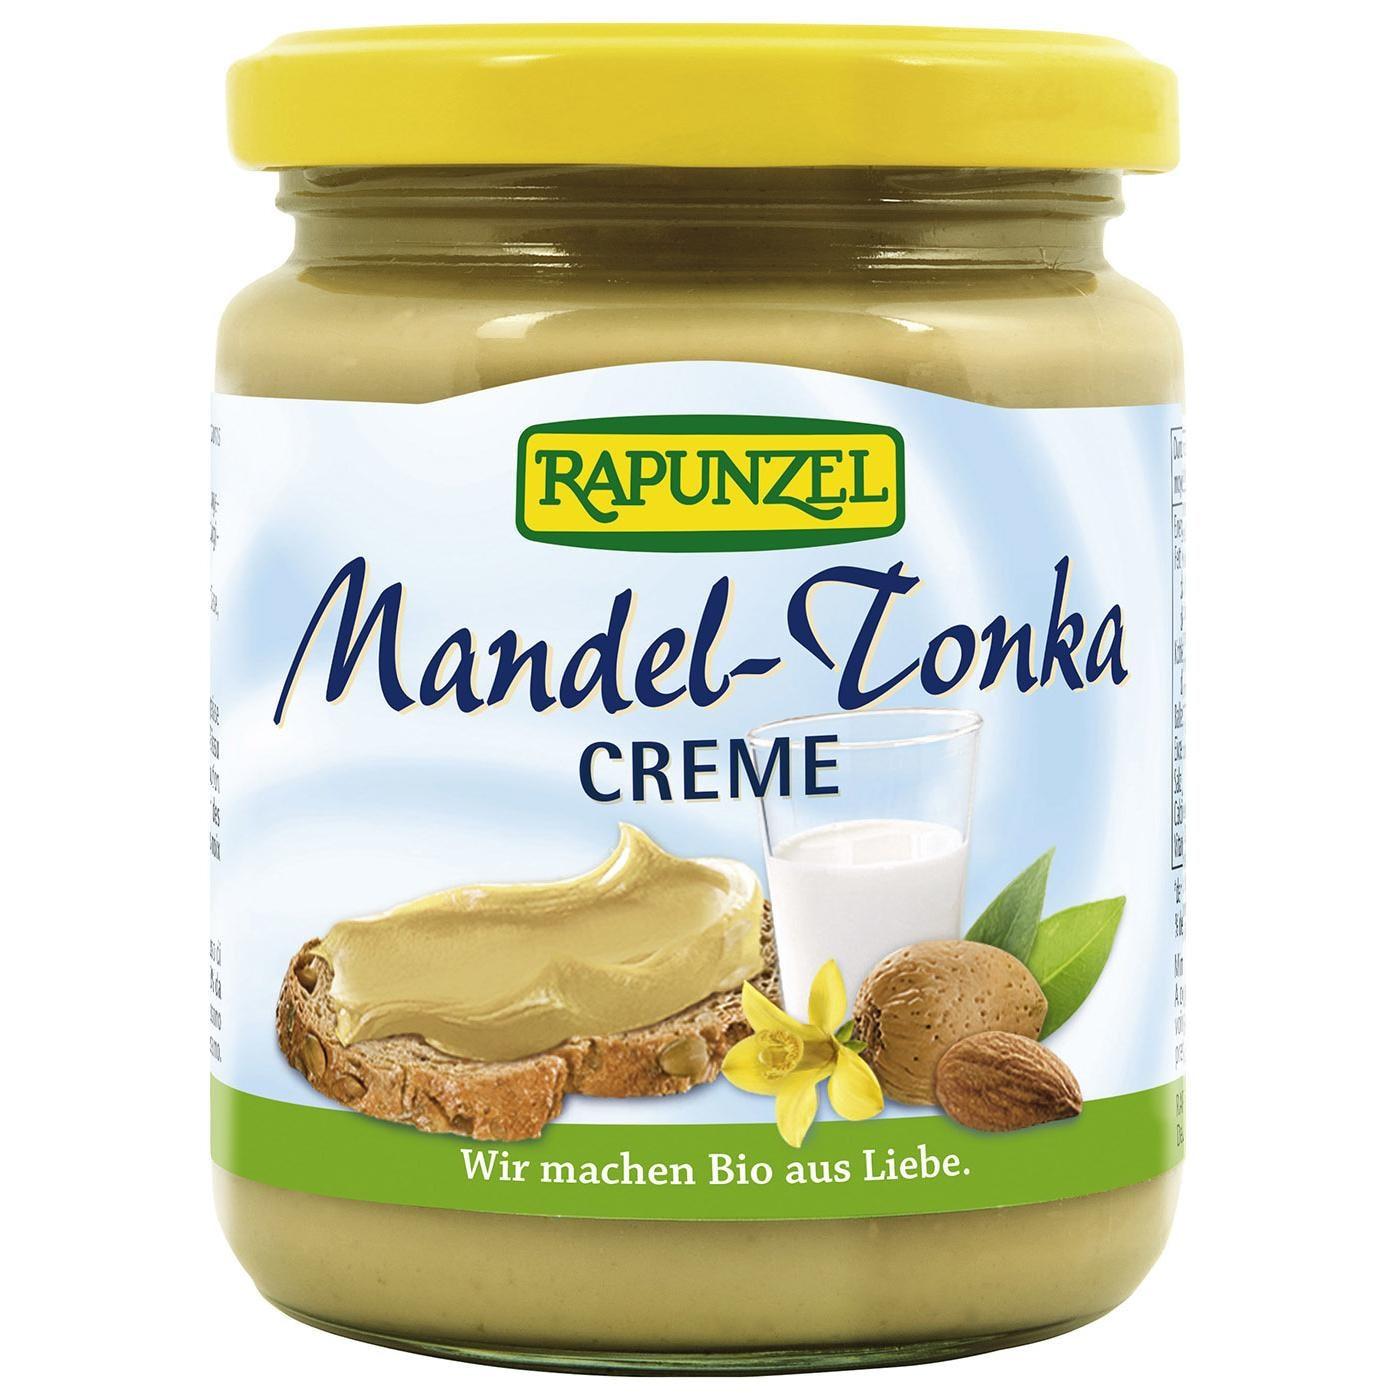 Rapunzel Bio Mandel-Tonka-Creme 250g